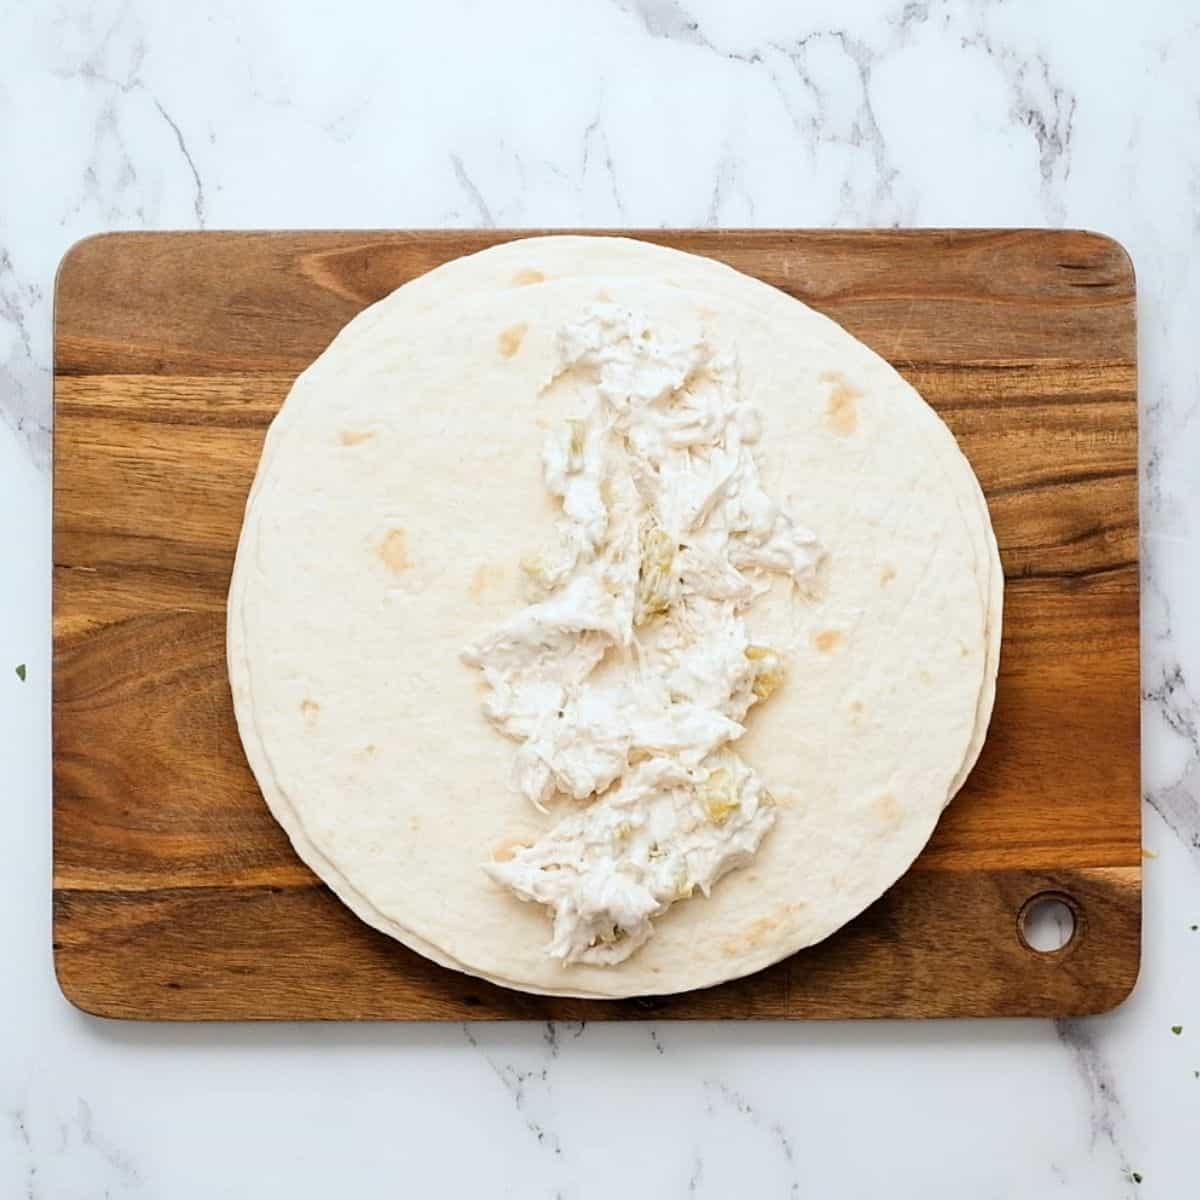 Chicken mixture on flour tortilla.